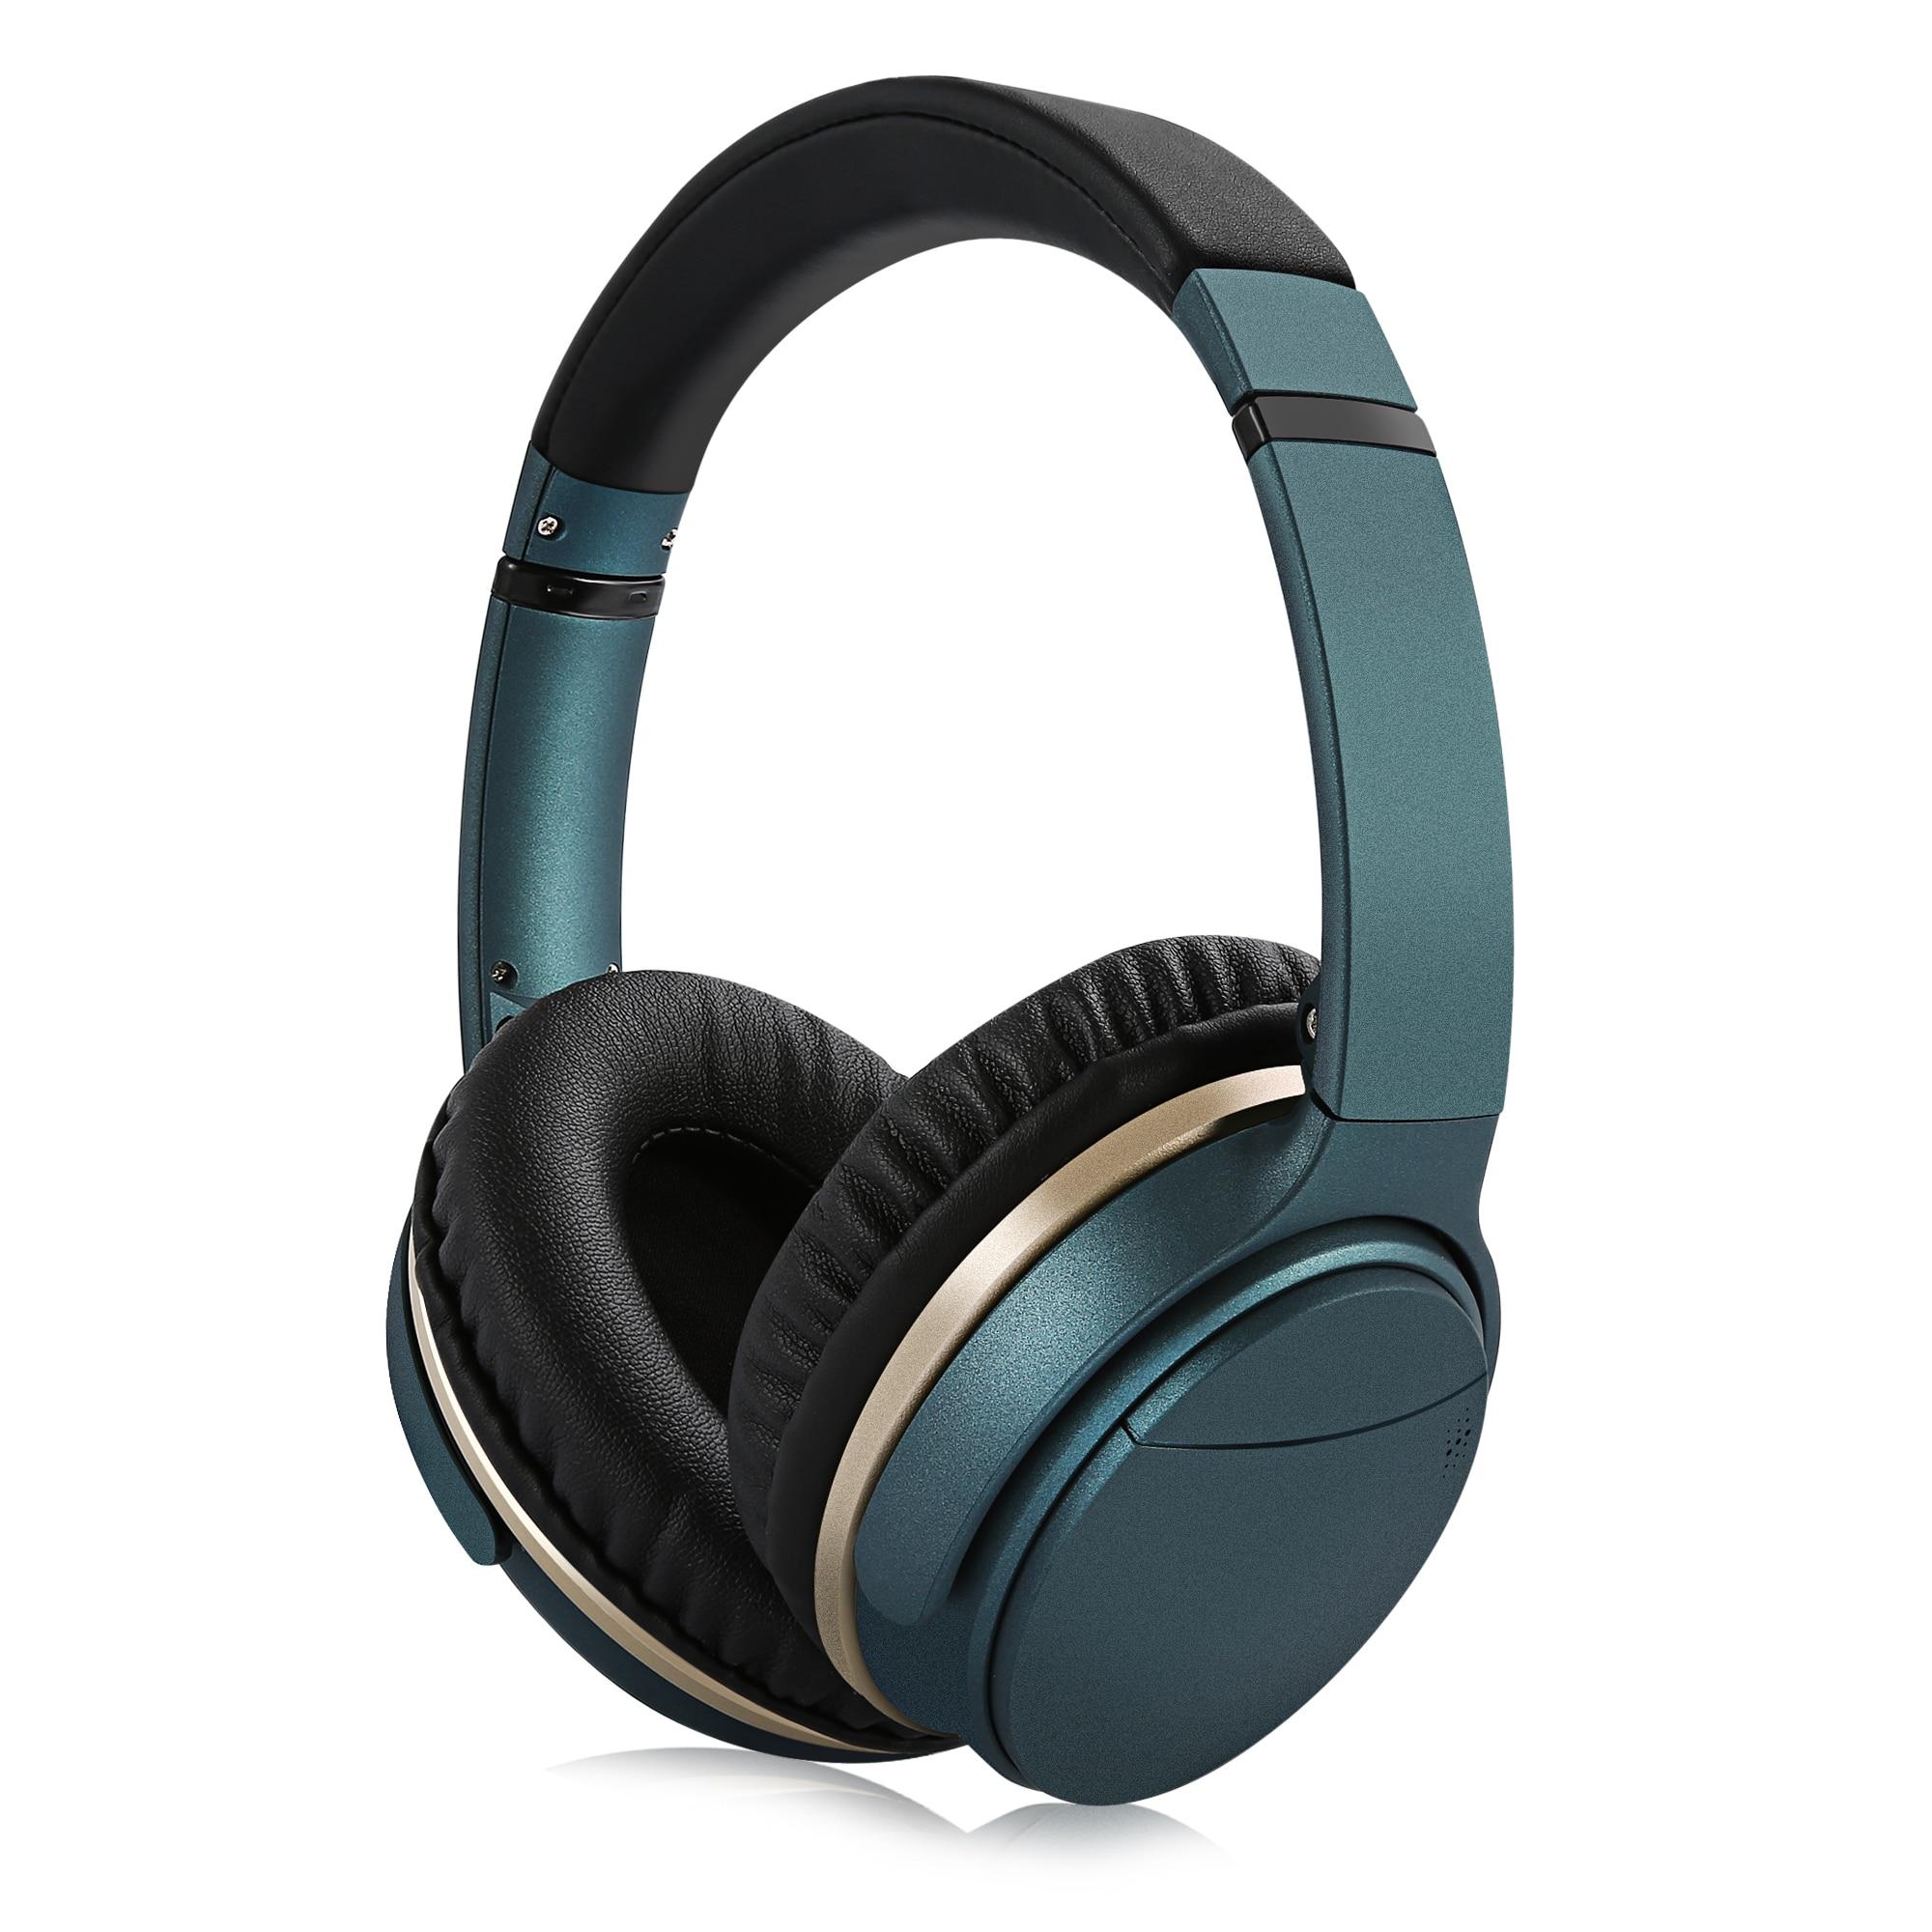 ZAPET Drehbare Bluetooth Kopfhörer Subwoofer Bluetooth Headset Drahtlose Sport Kopfhörer mit Weichen Baumwolle Ohrenschützer